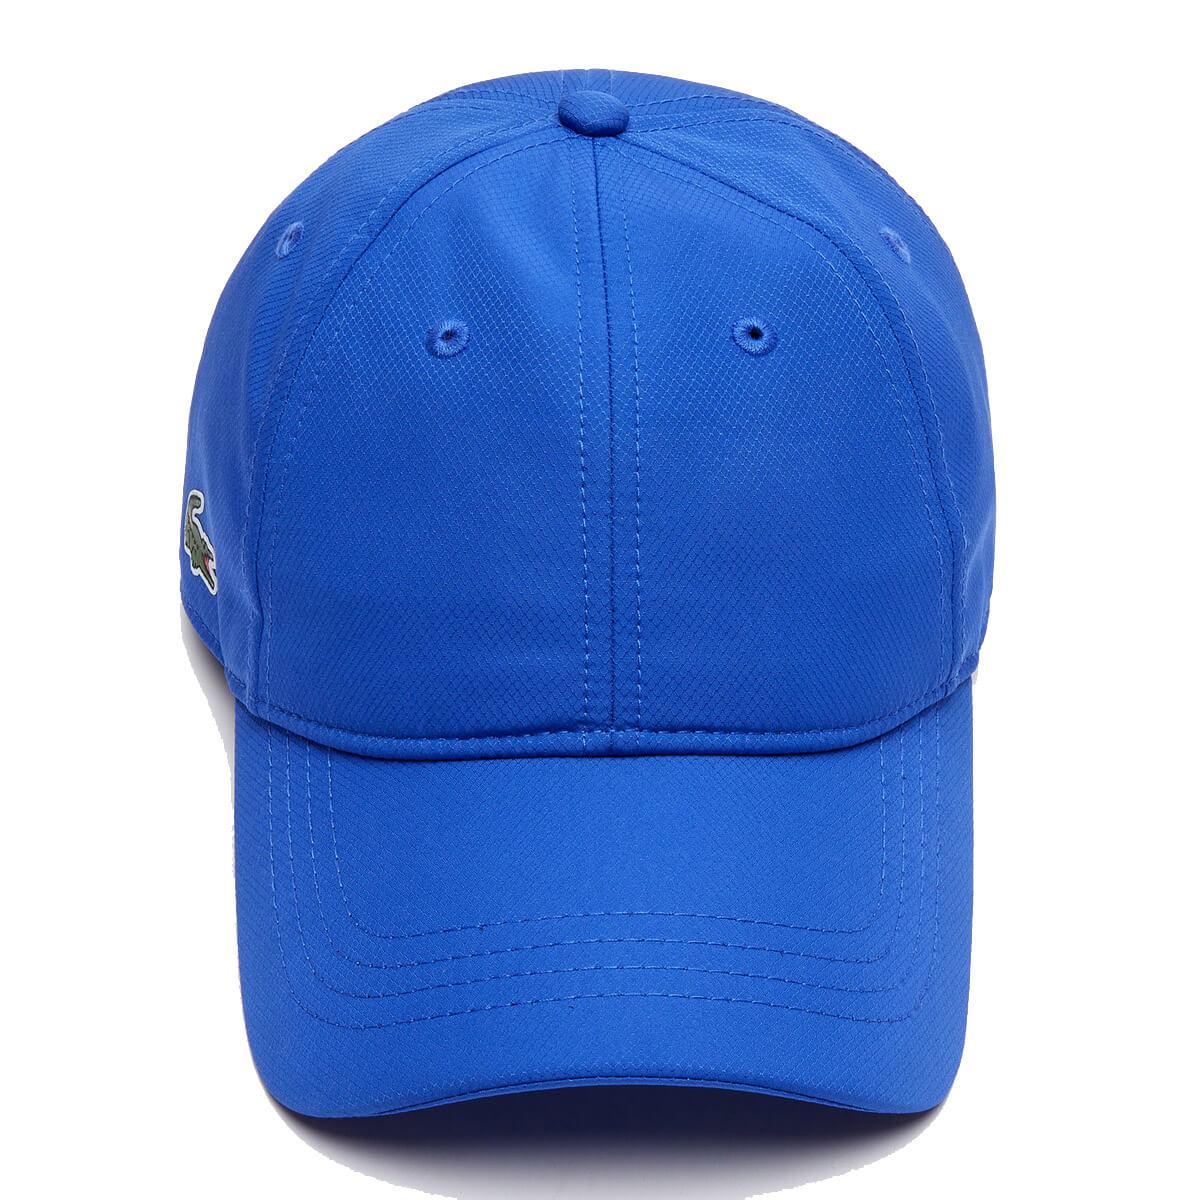 Lacoste-Mens-2020-Sports-Weave-Taffeta-Solid-Diamond-Baseball-Cap thumbnail 9